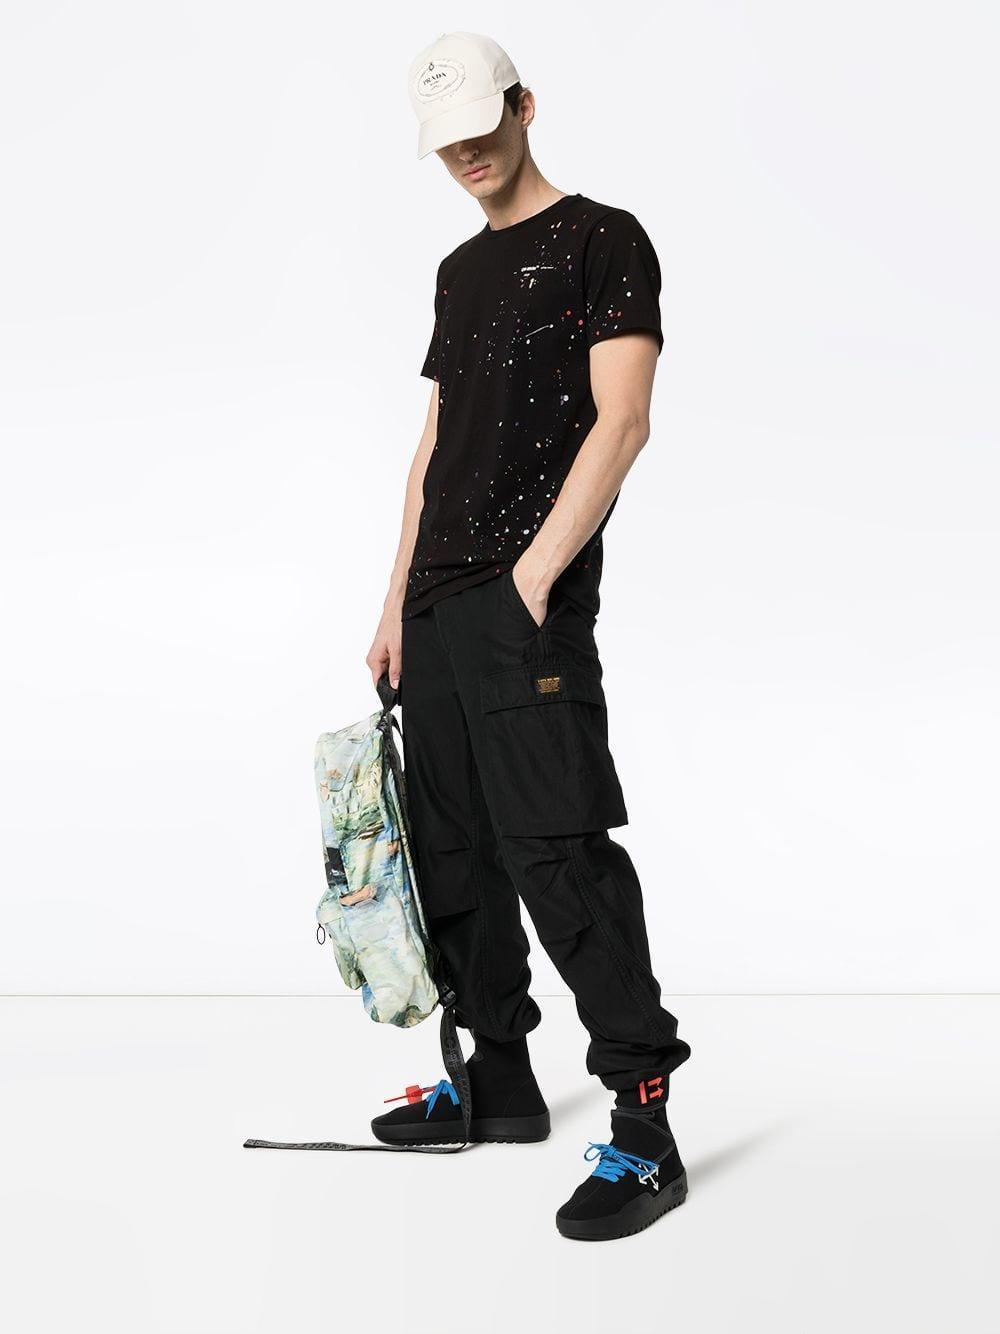 bdf8587ece50 Lyst - Off-White c o Virgil Abloh Paint Splattered Cotton T-shirt in Black  for Men - Save 26%